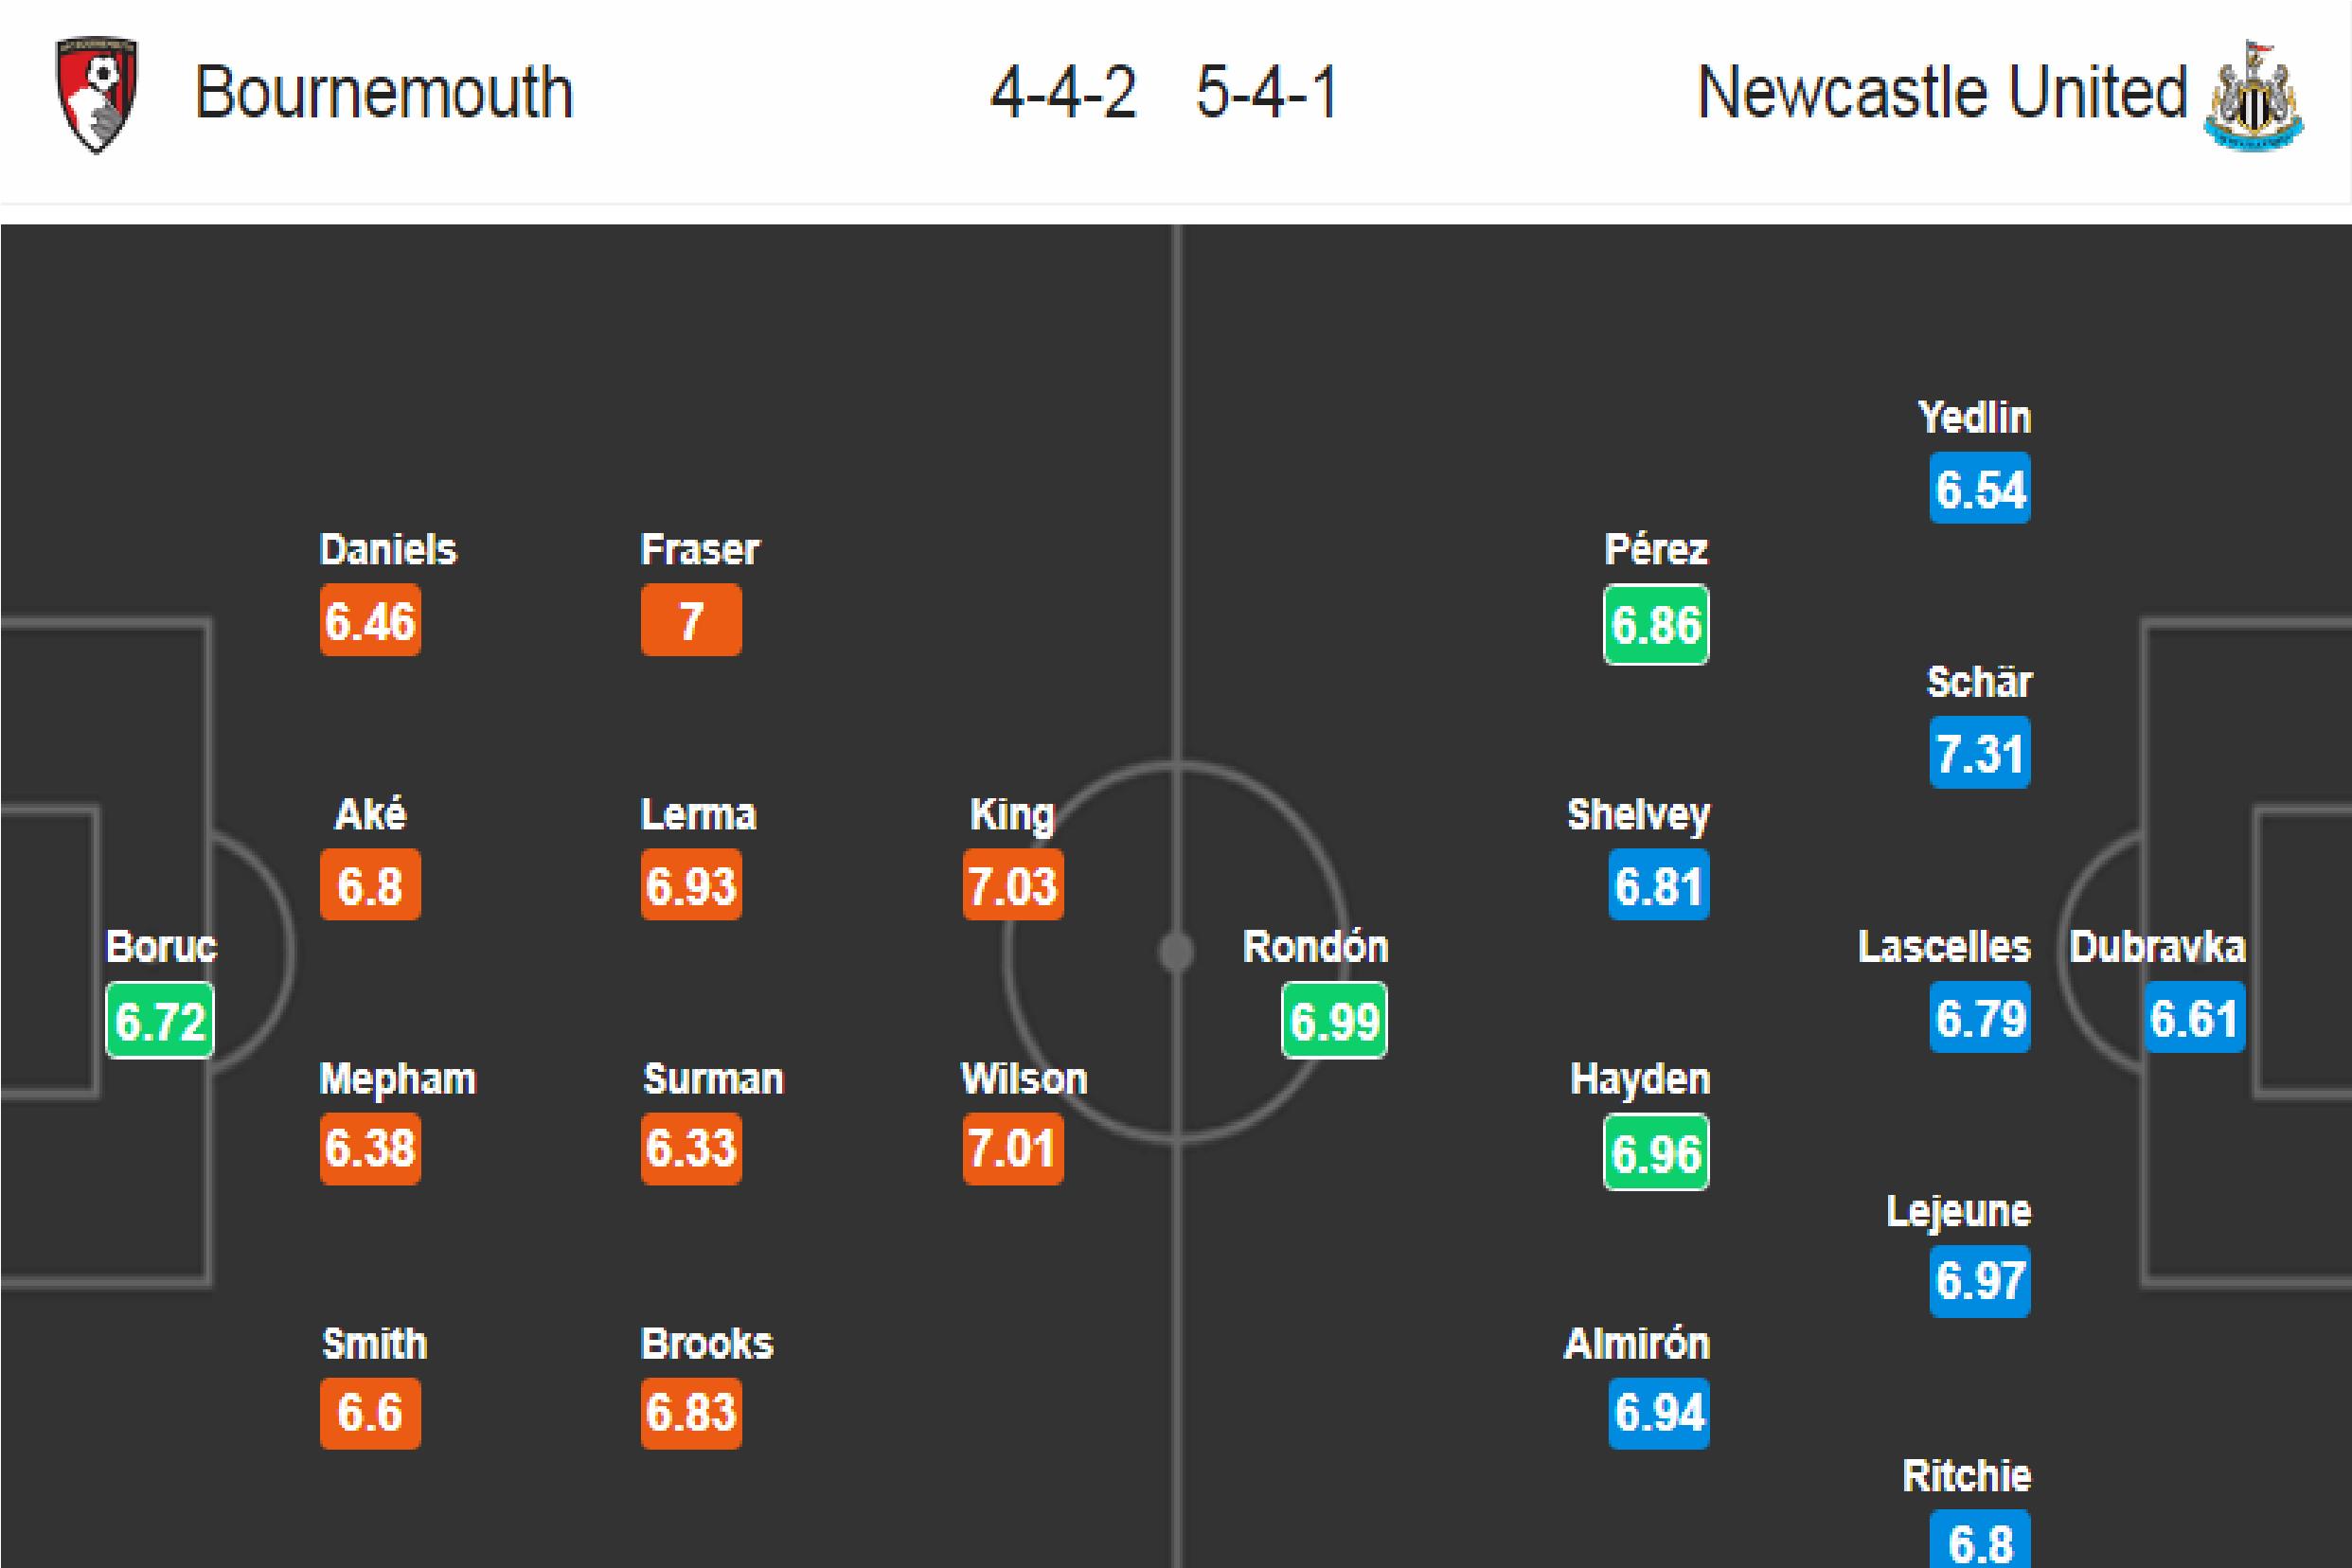 Bournemouth - Newcastle